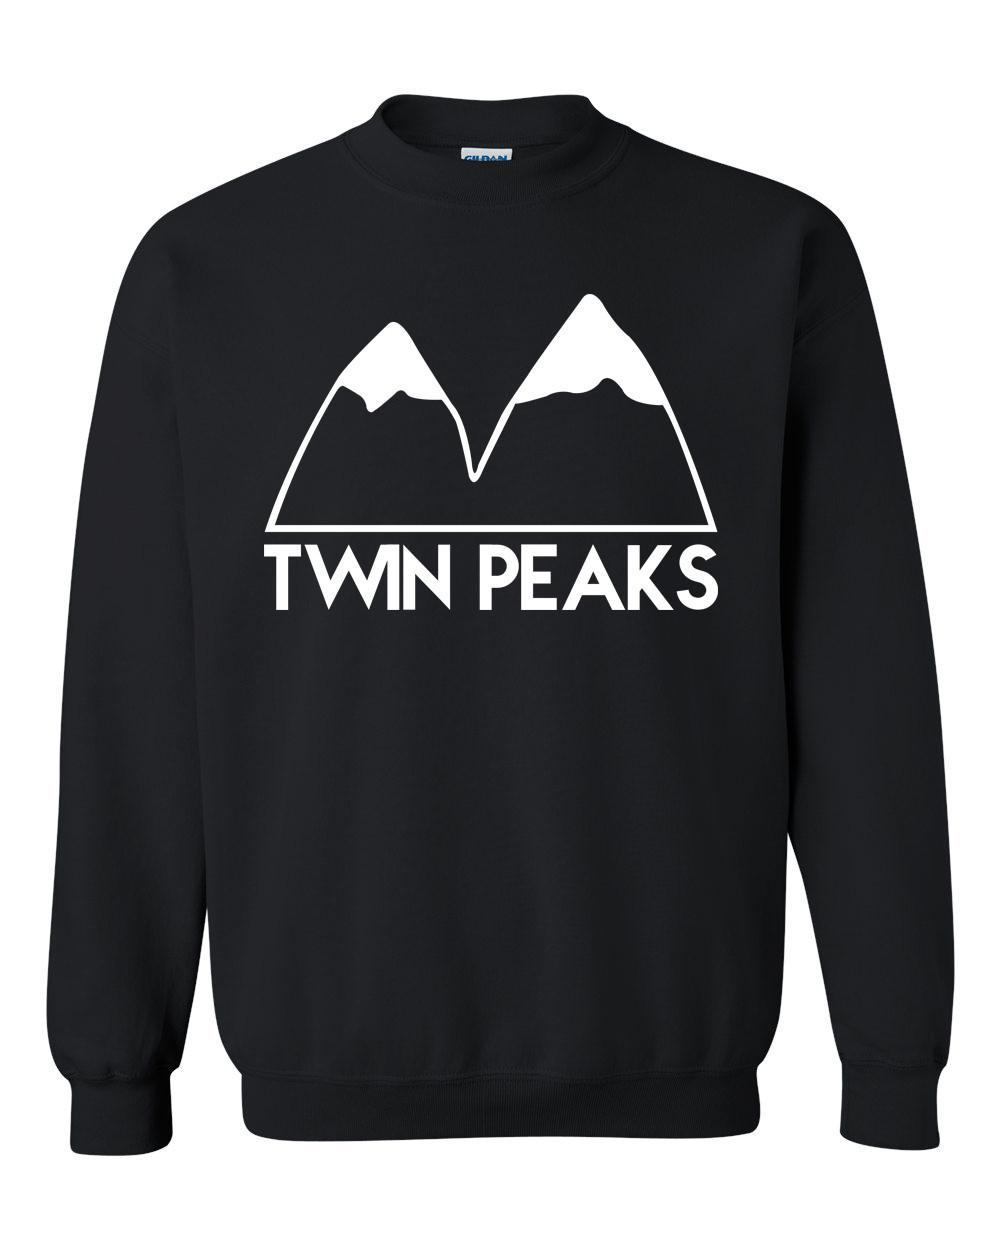 Twin peaks 2 0000 layer 1 53645aba 2424 4983 9658 c37104d8e274